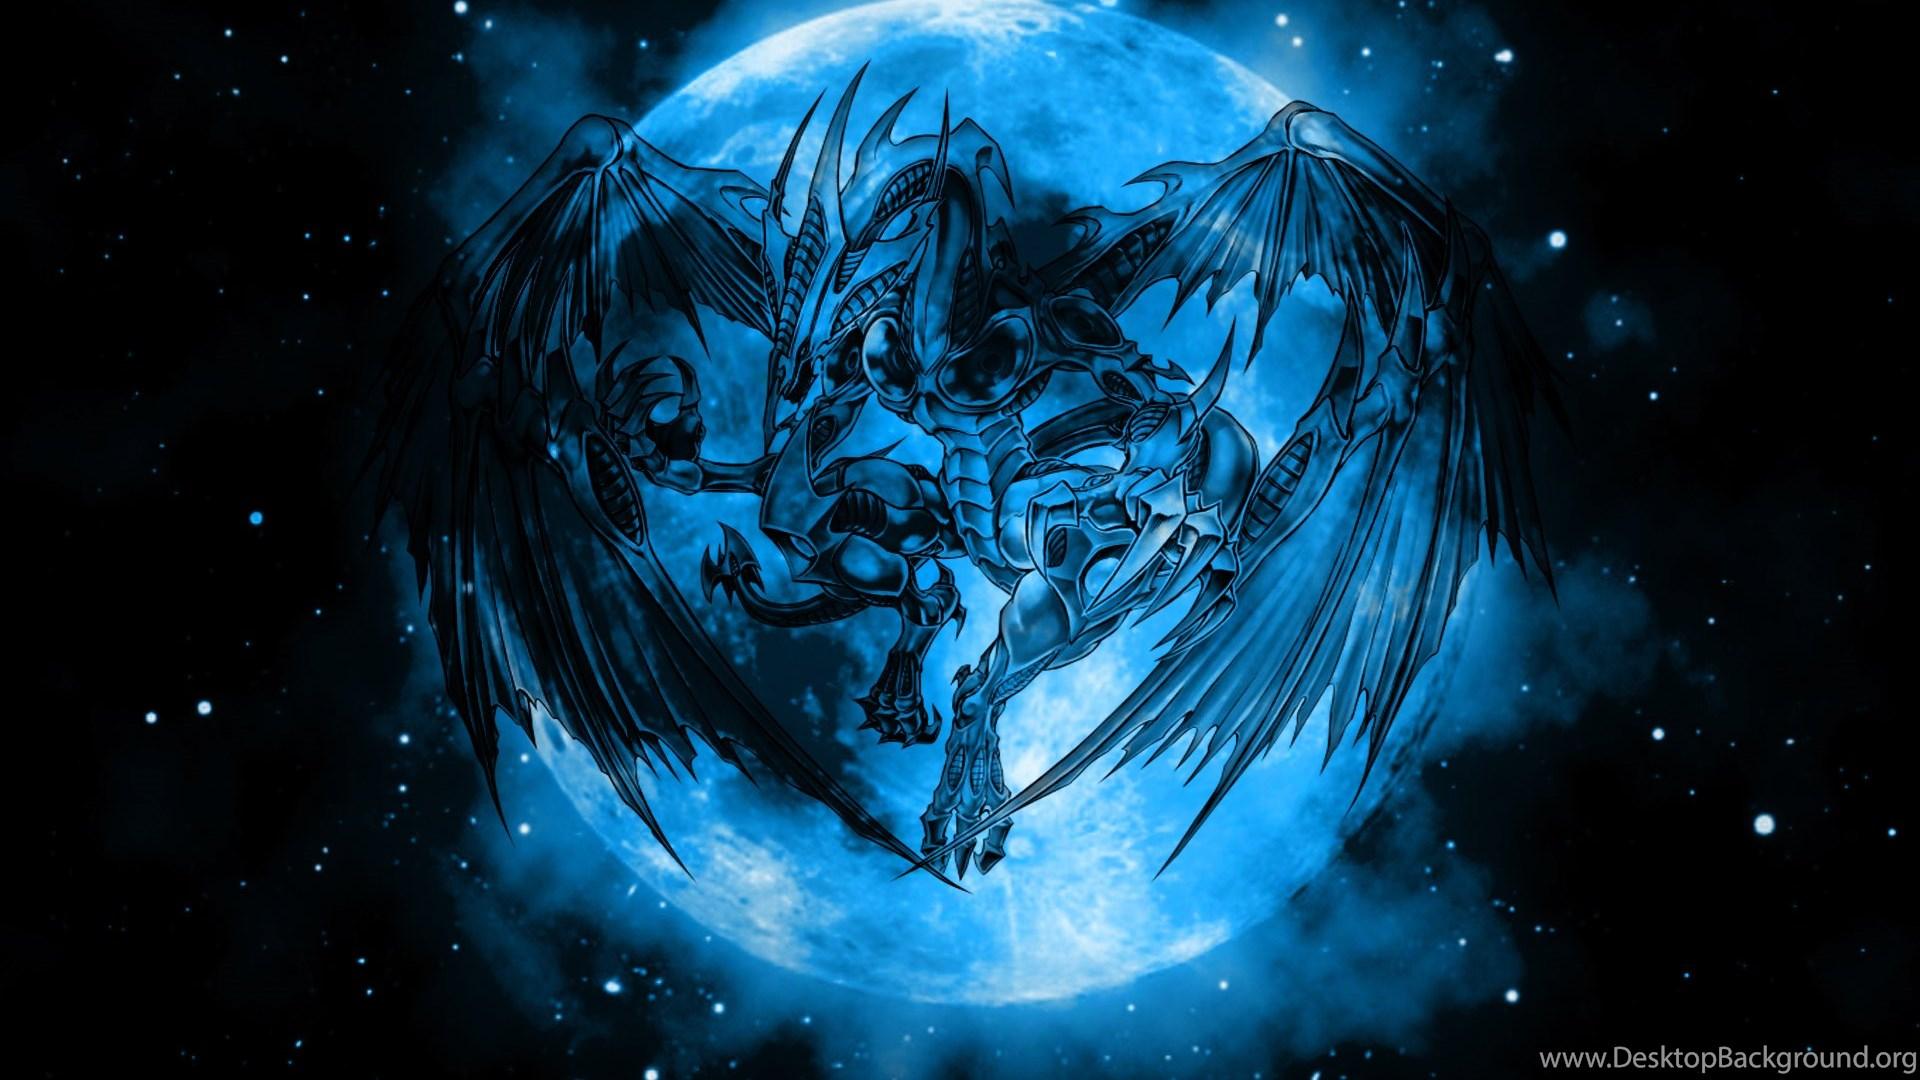 evil dragon hd wallpapers vector & designs wallpapers, cool dragon